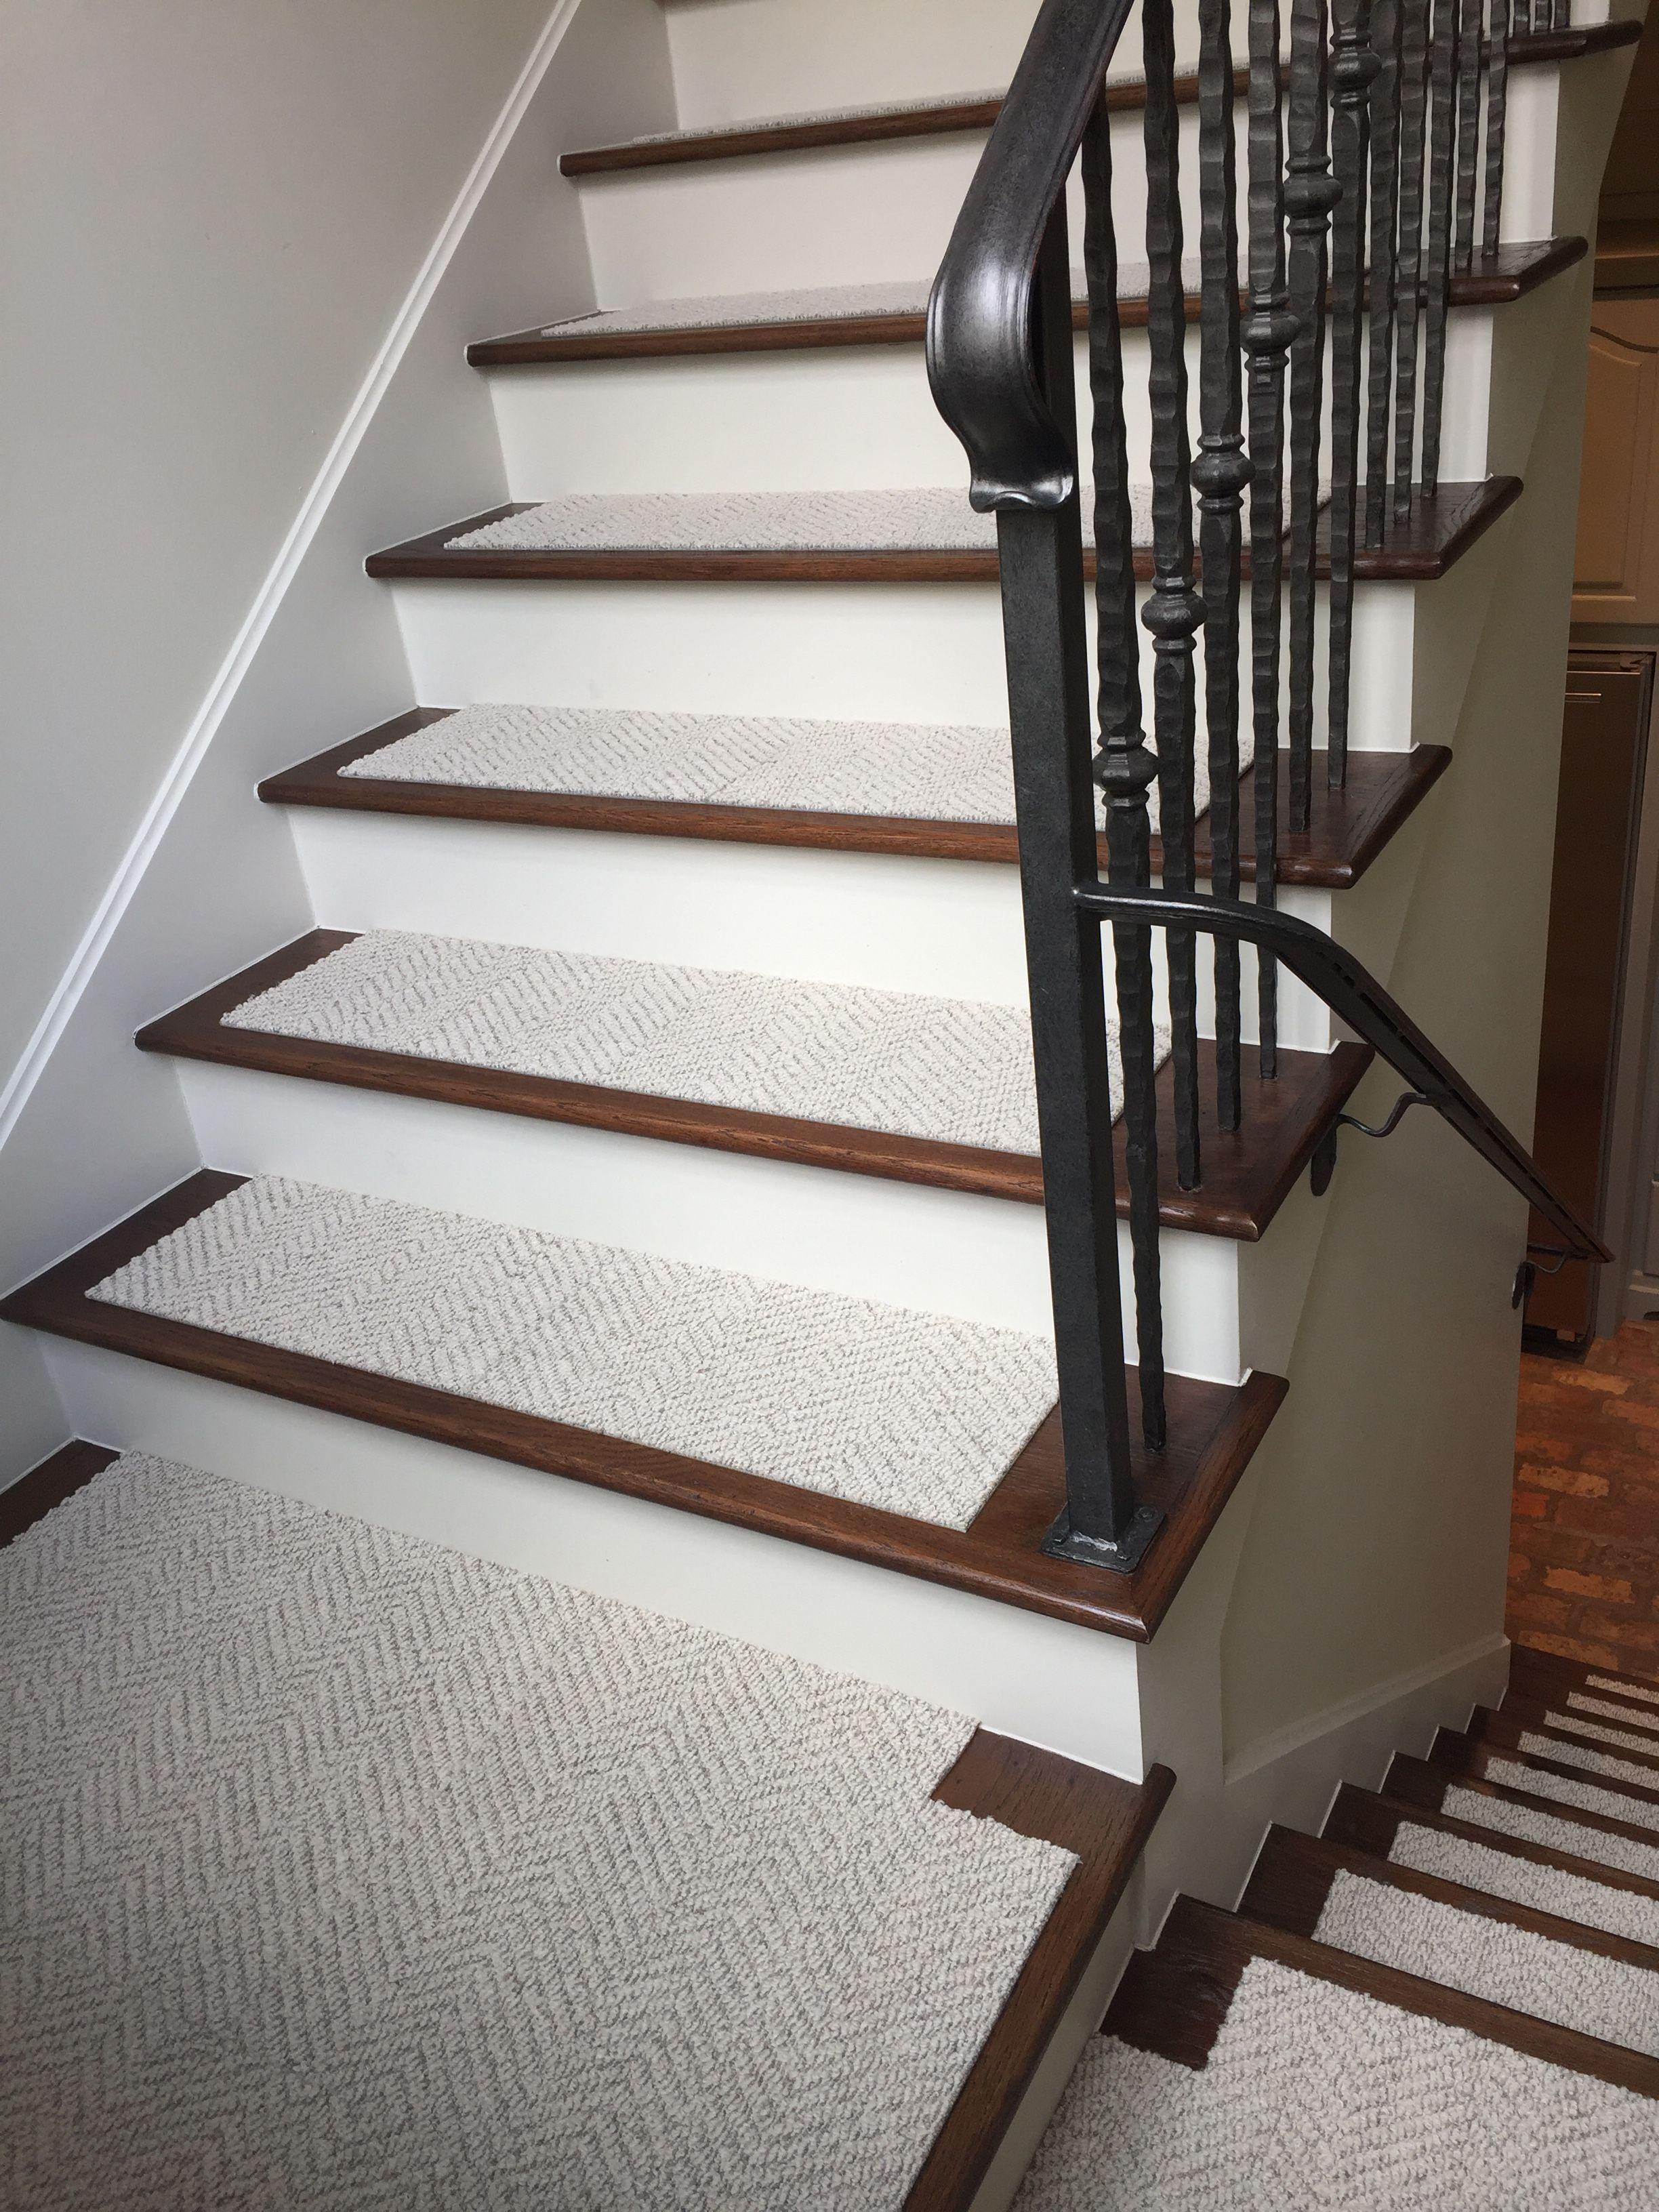 creative flor tiles on stairstile design ideas